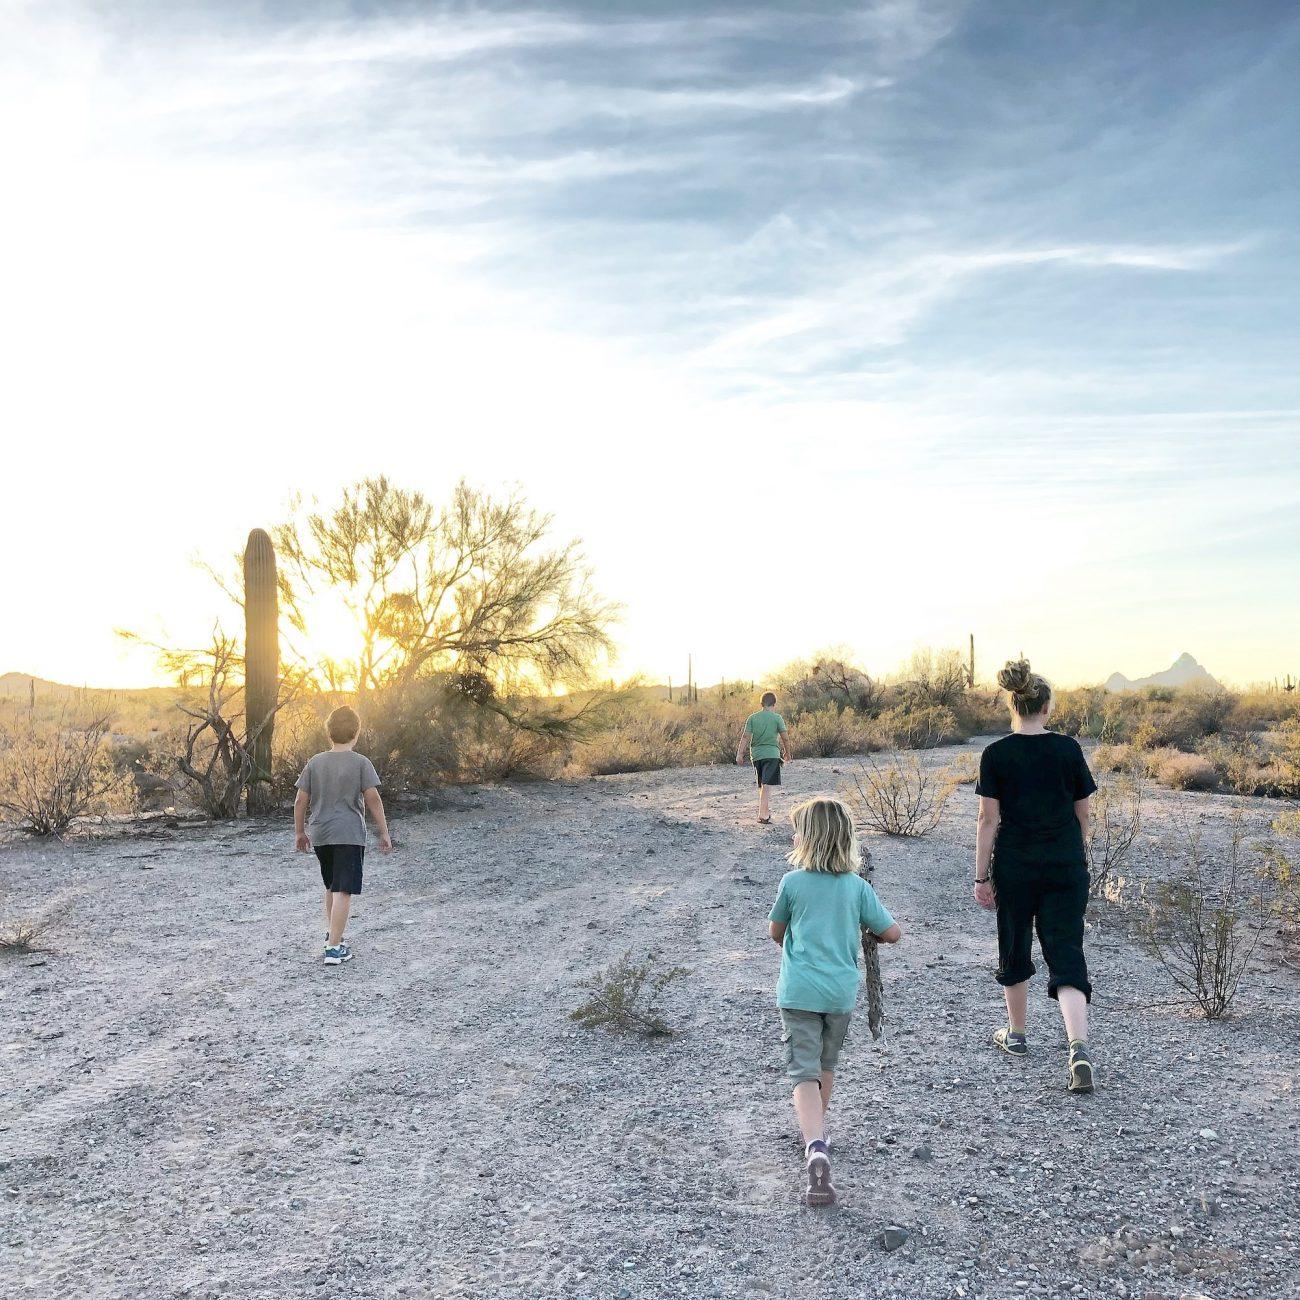 Kids hiking in desert wash near Ajo, AZ.